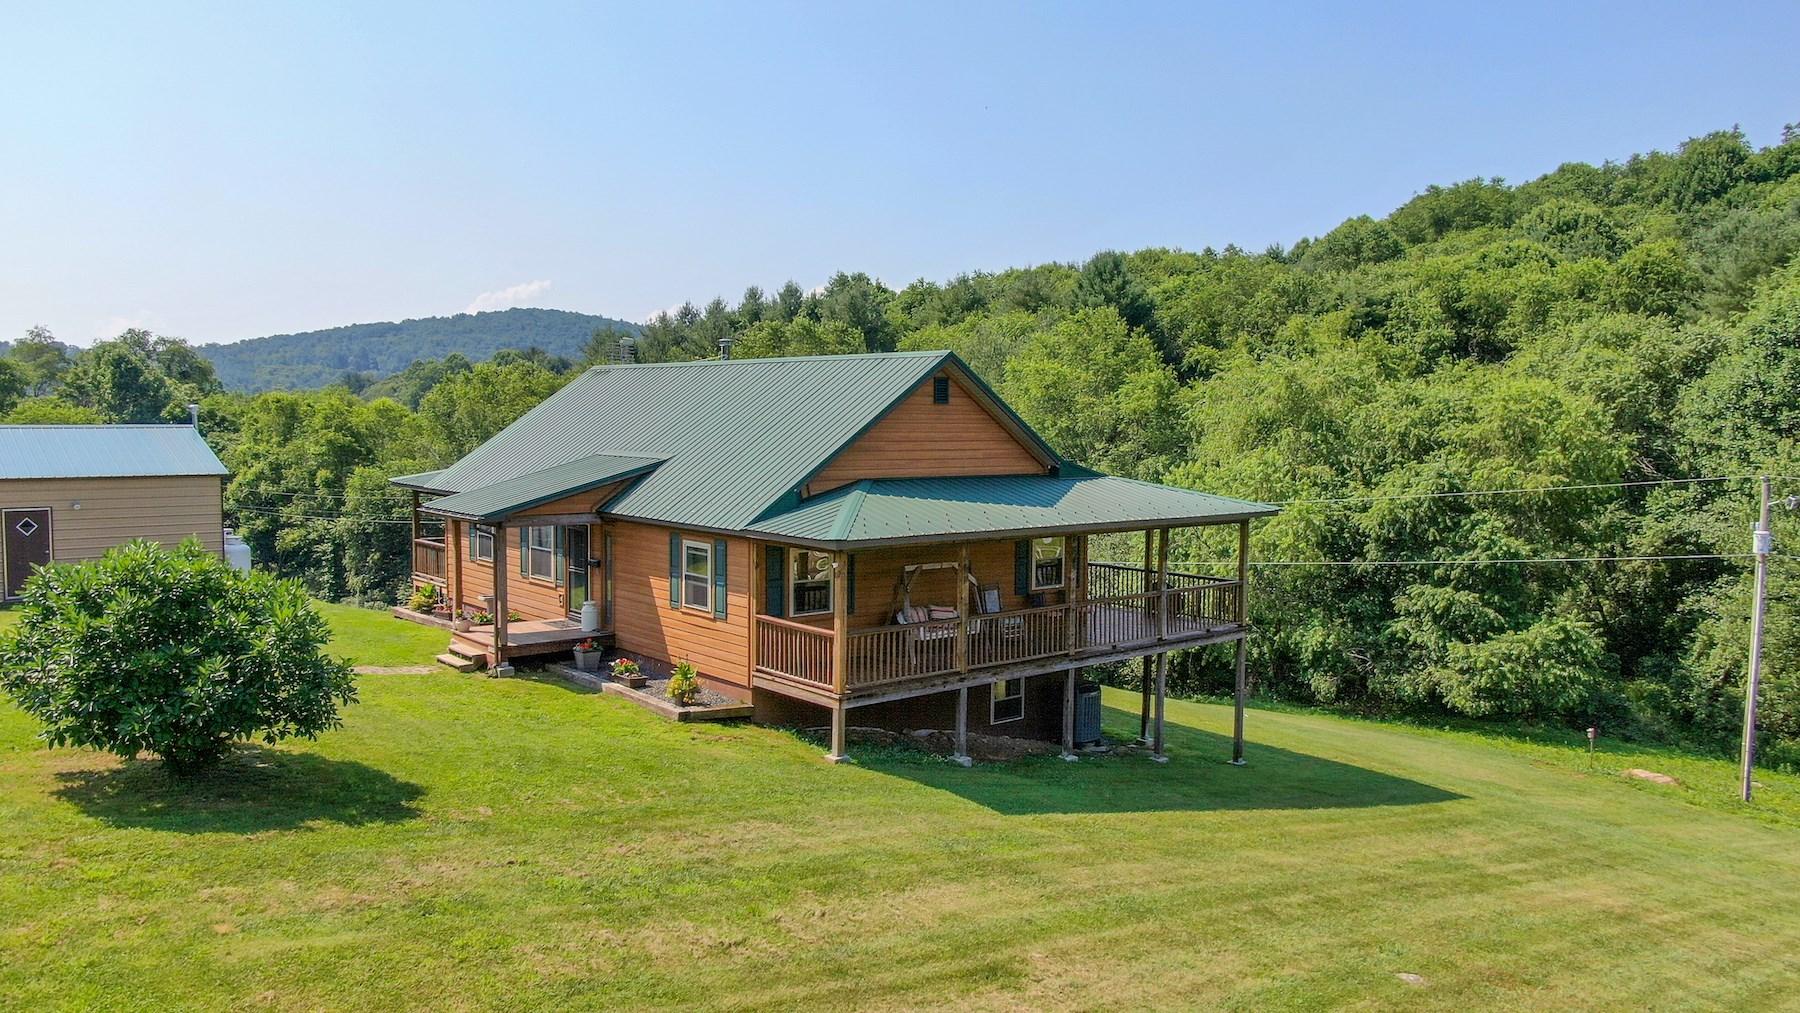 Beautiful Horse Farm for Sale in Fries VA! - VA Real Estate